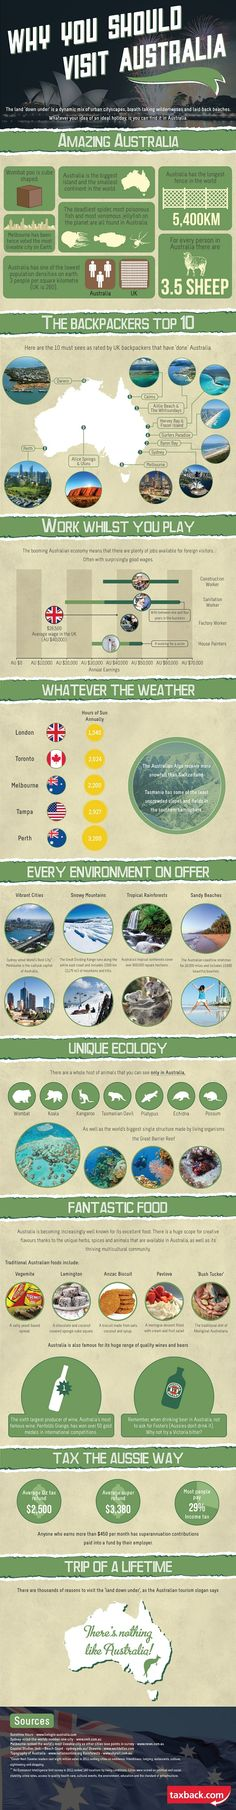 Why You Should Visit Australia + 2 children and 3 grandchildren!!!